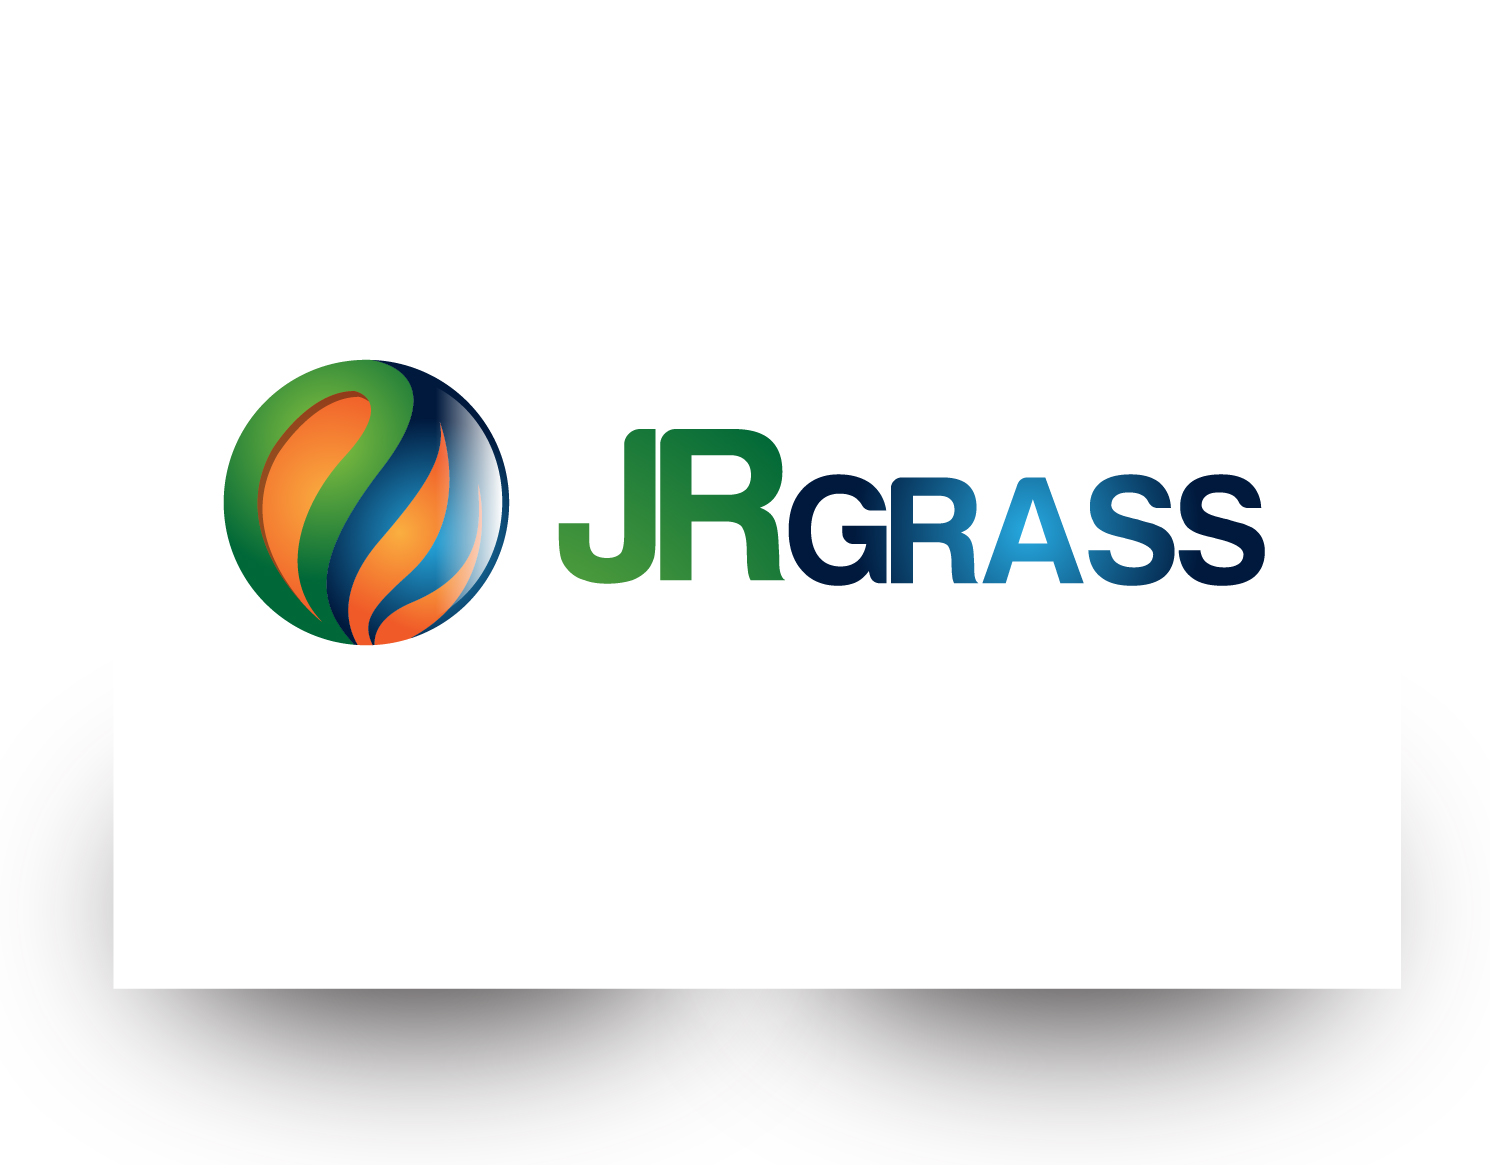 Logo Design by demang - Entry No. 83 in the Logo Design Contest Inspiring Logo Design for JR Grass.